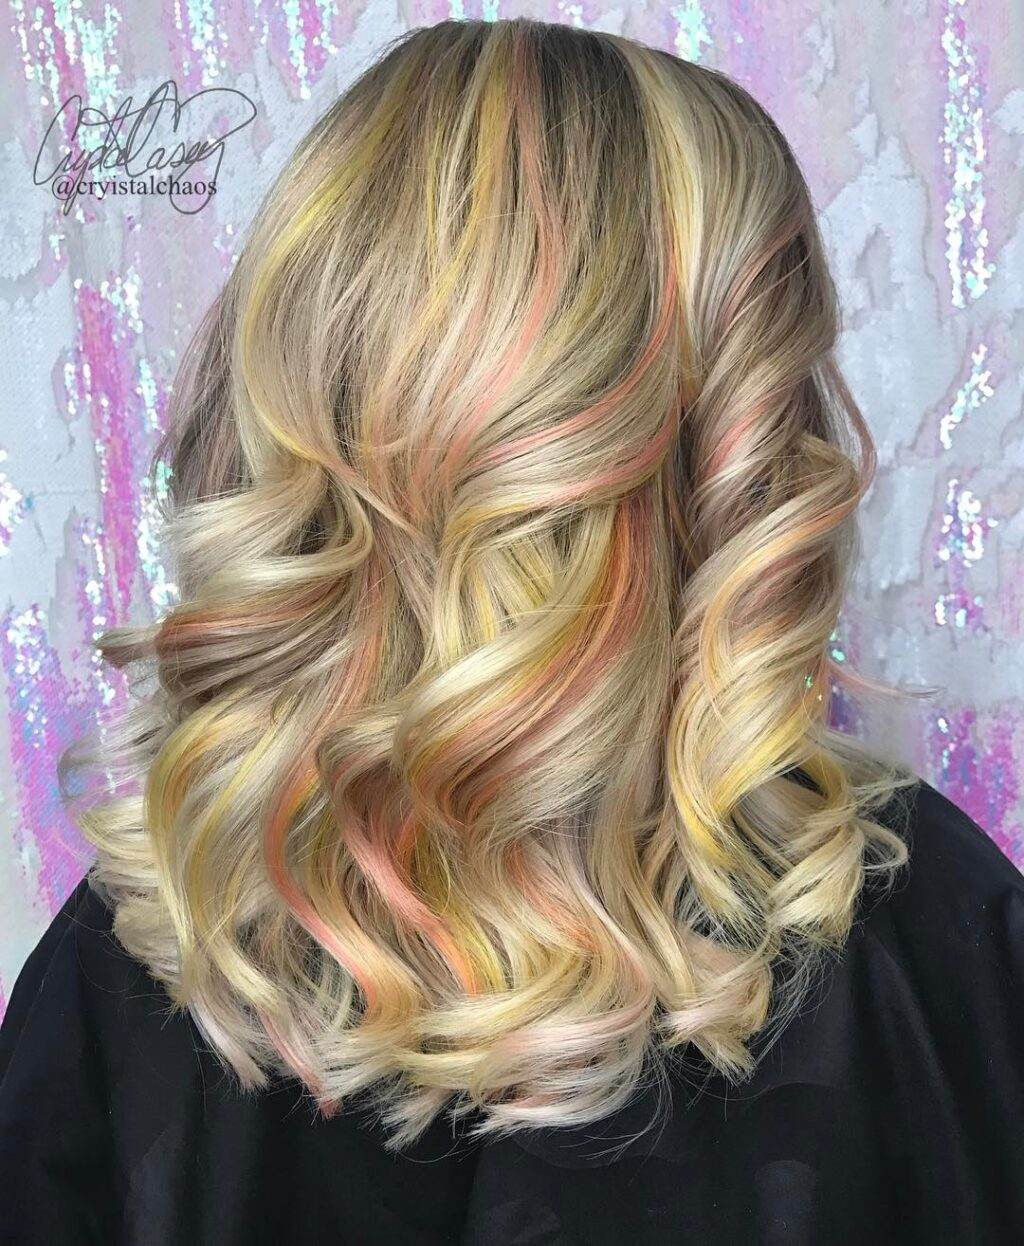 Blonde oil slick hair